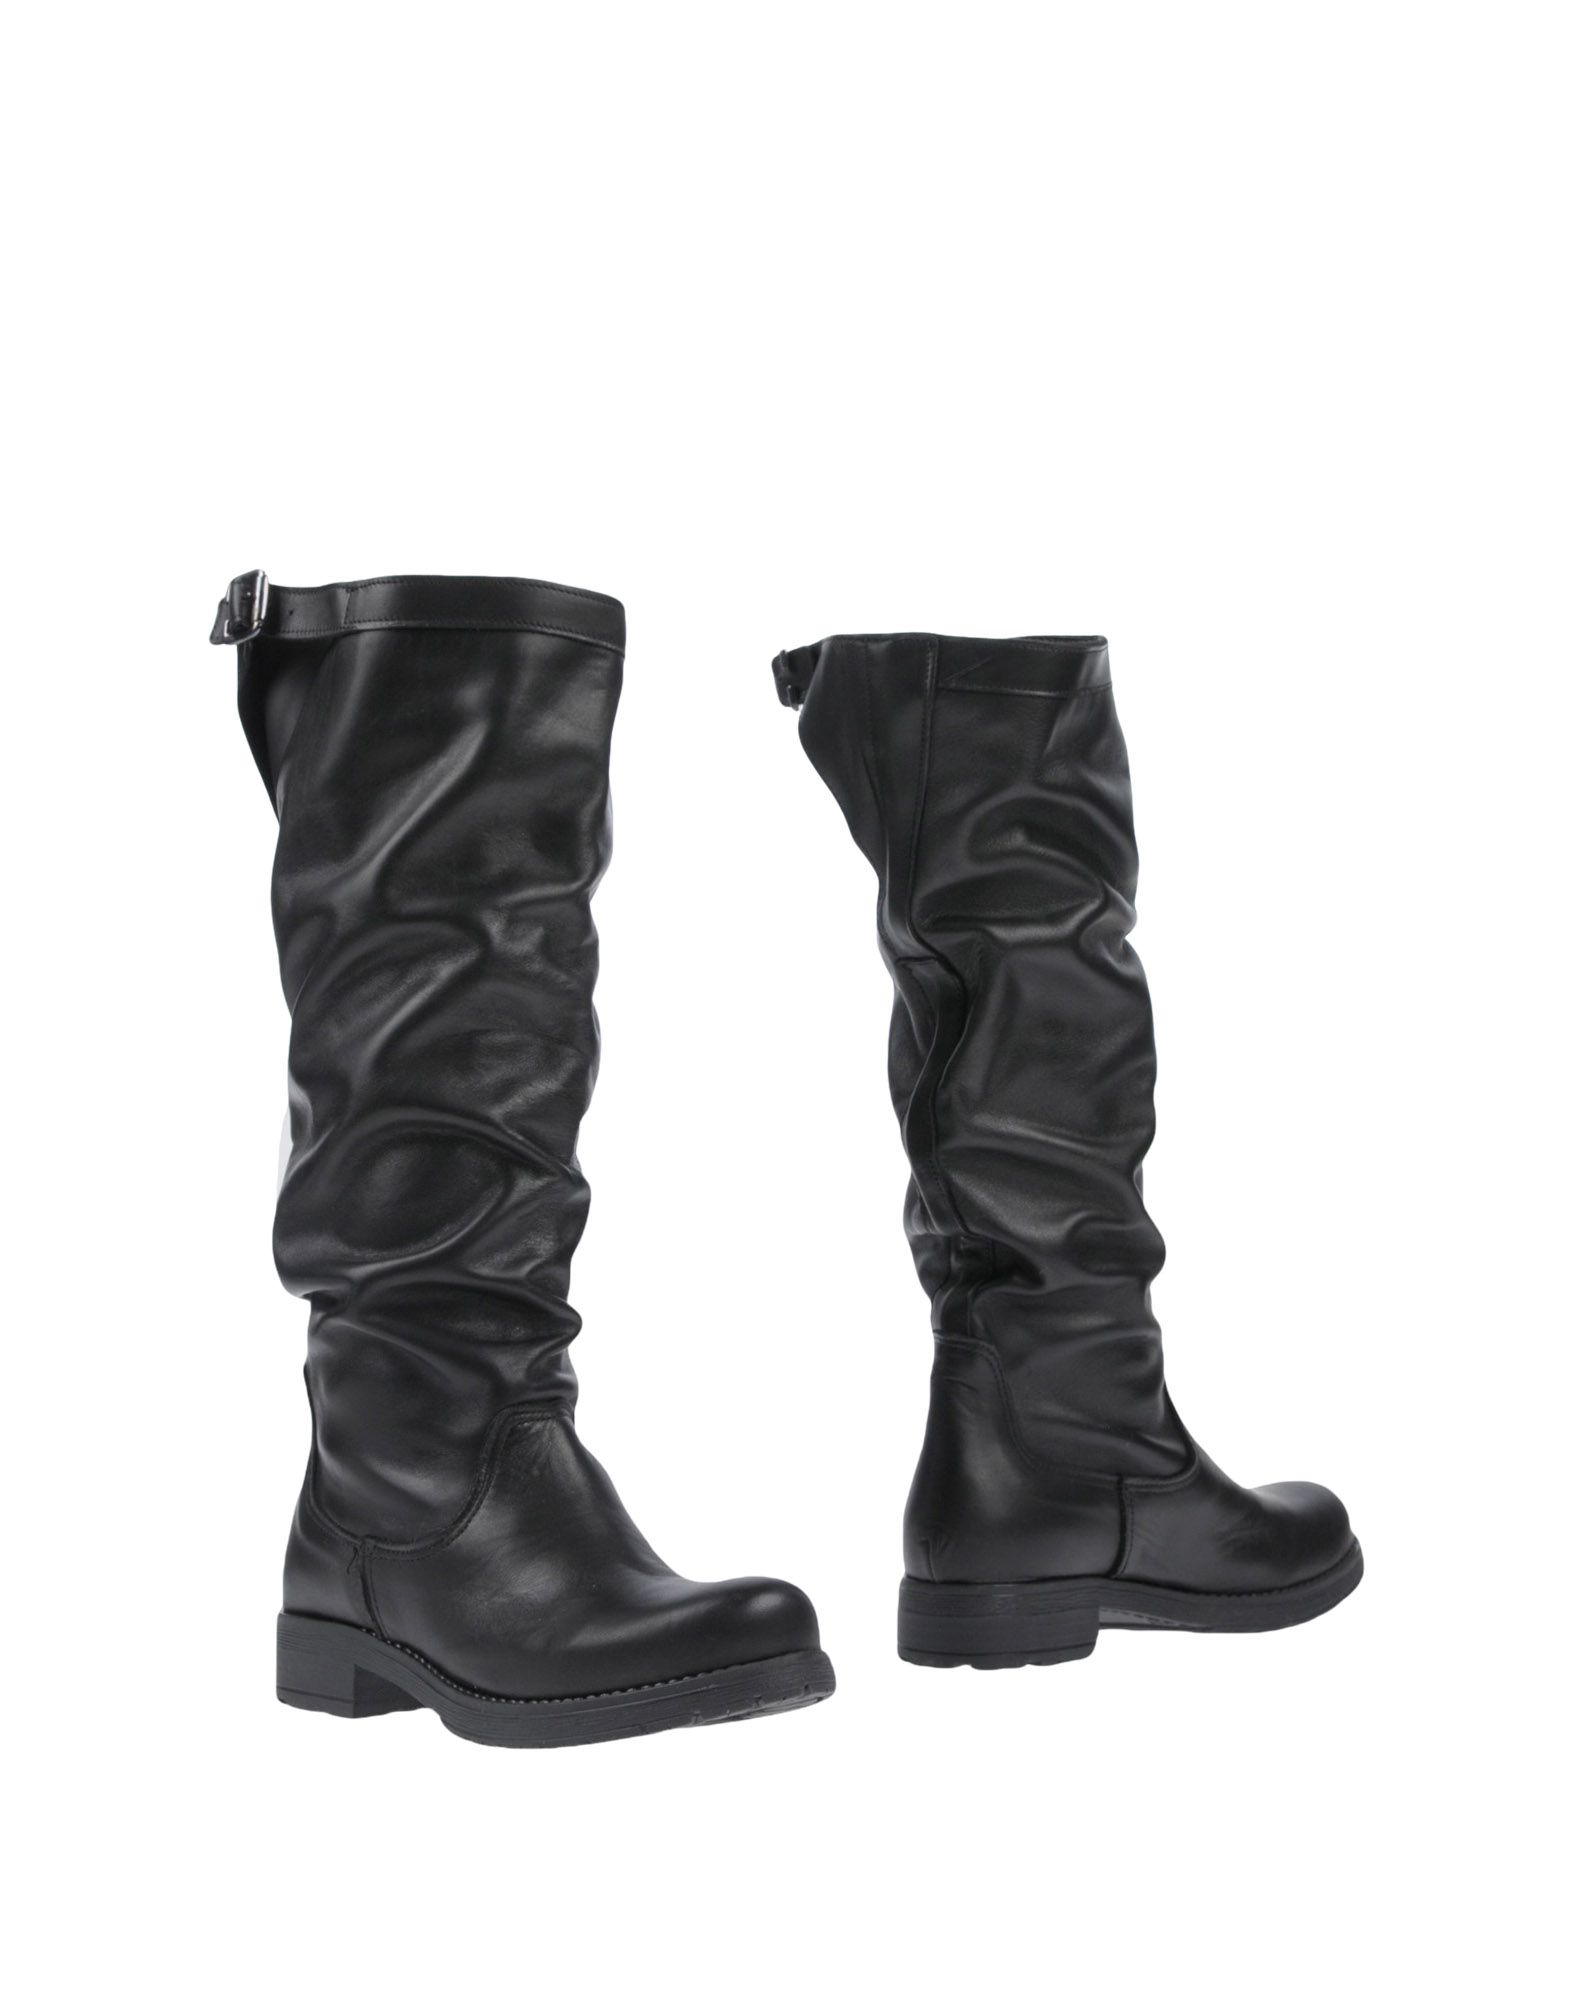 Oroscuro Boots Boots - Women Oroscuro Boots Oroscuro online on  United Kingdom - 11455379CC 7bceb1